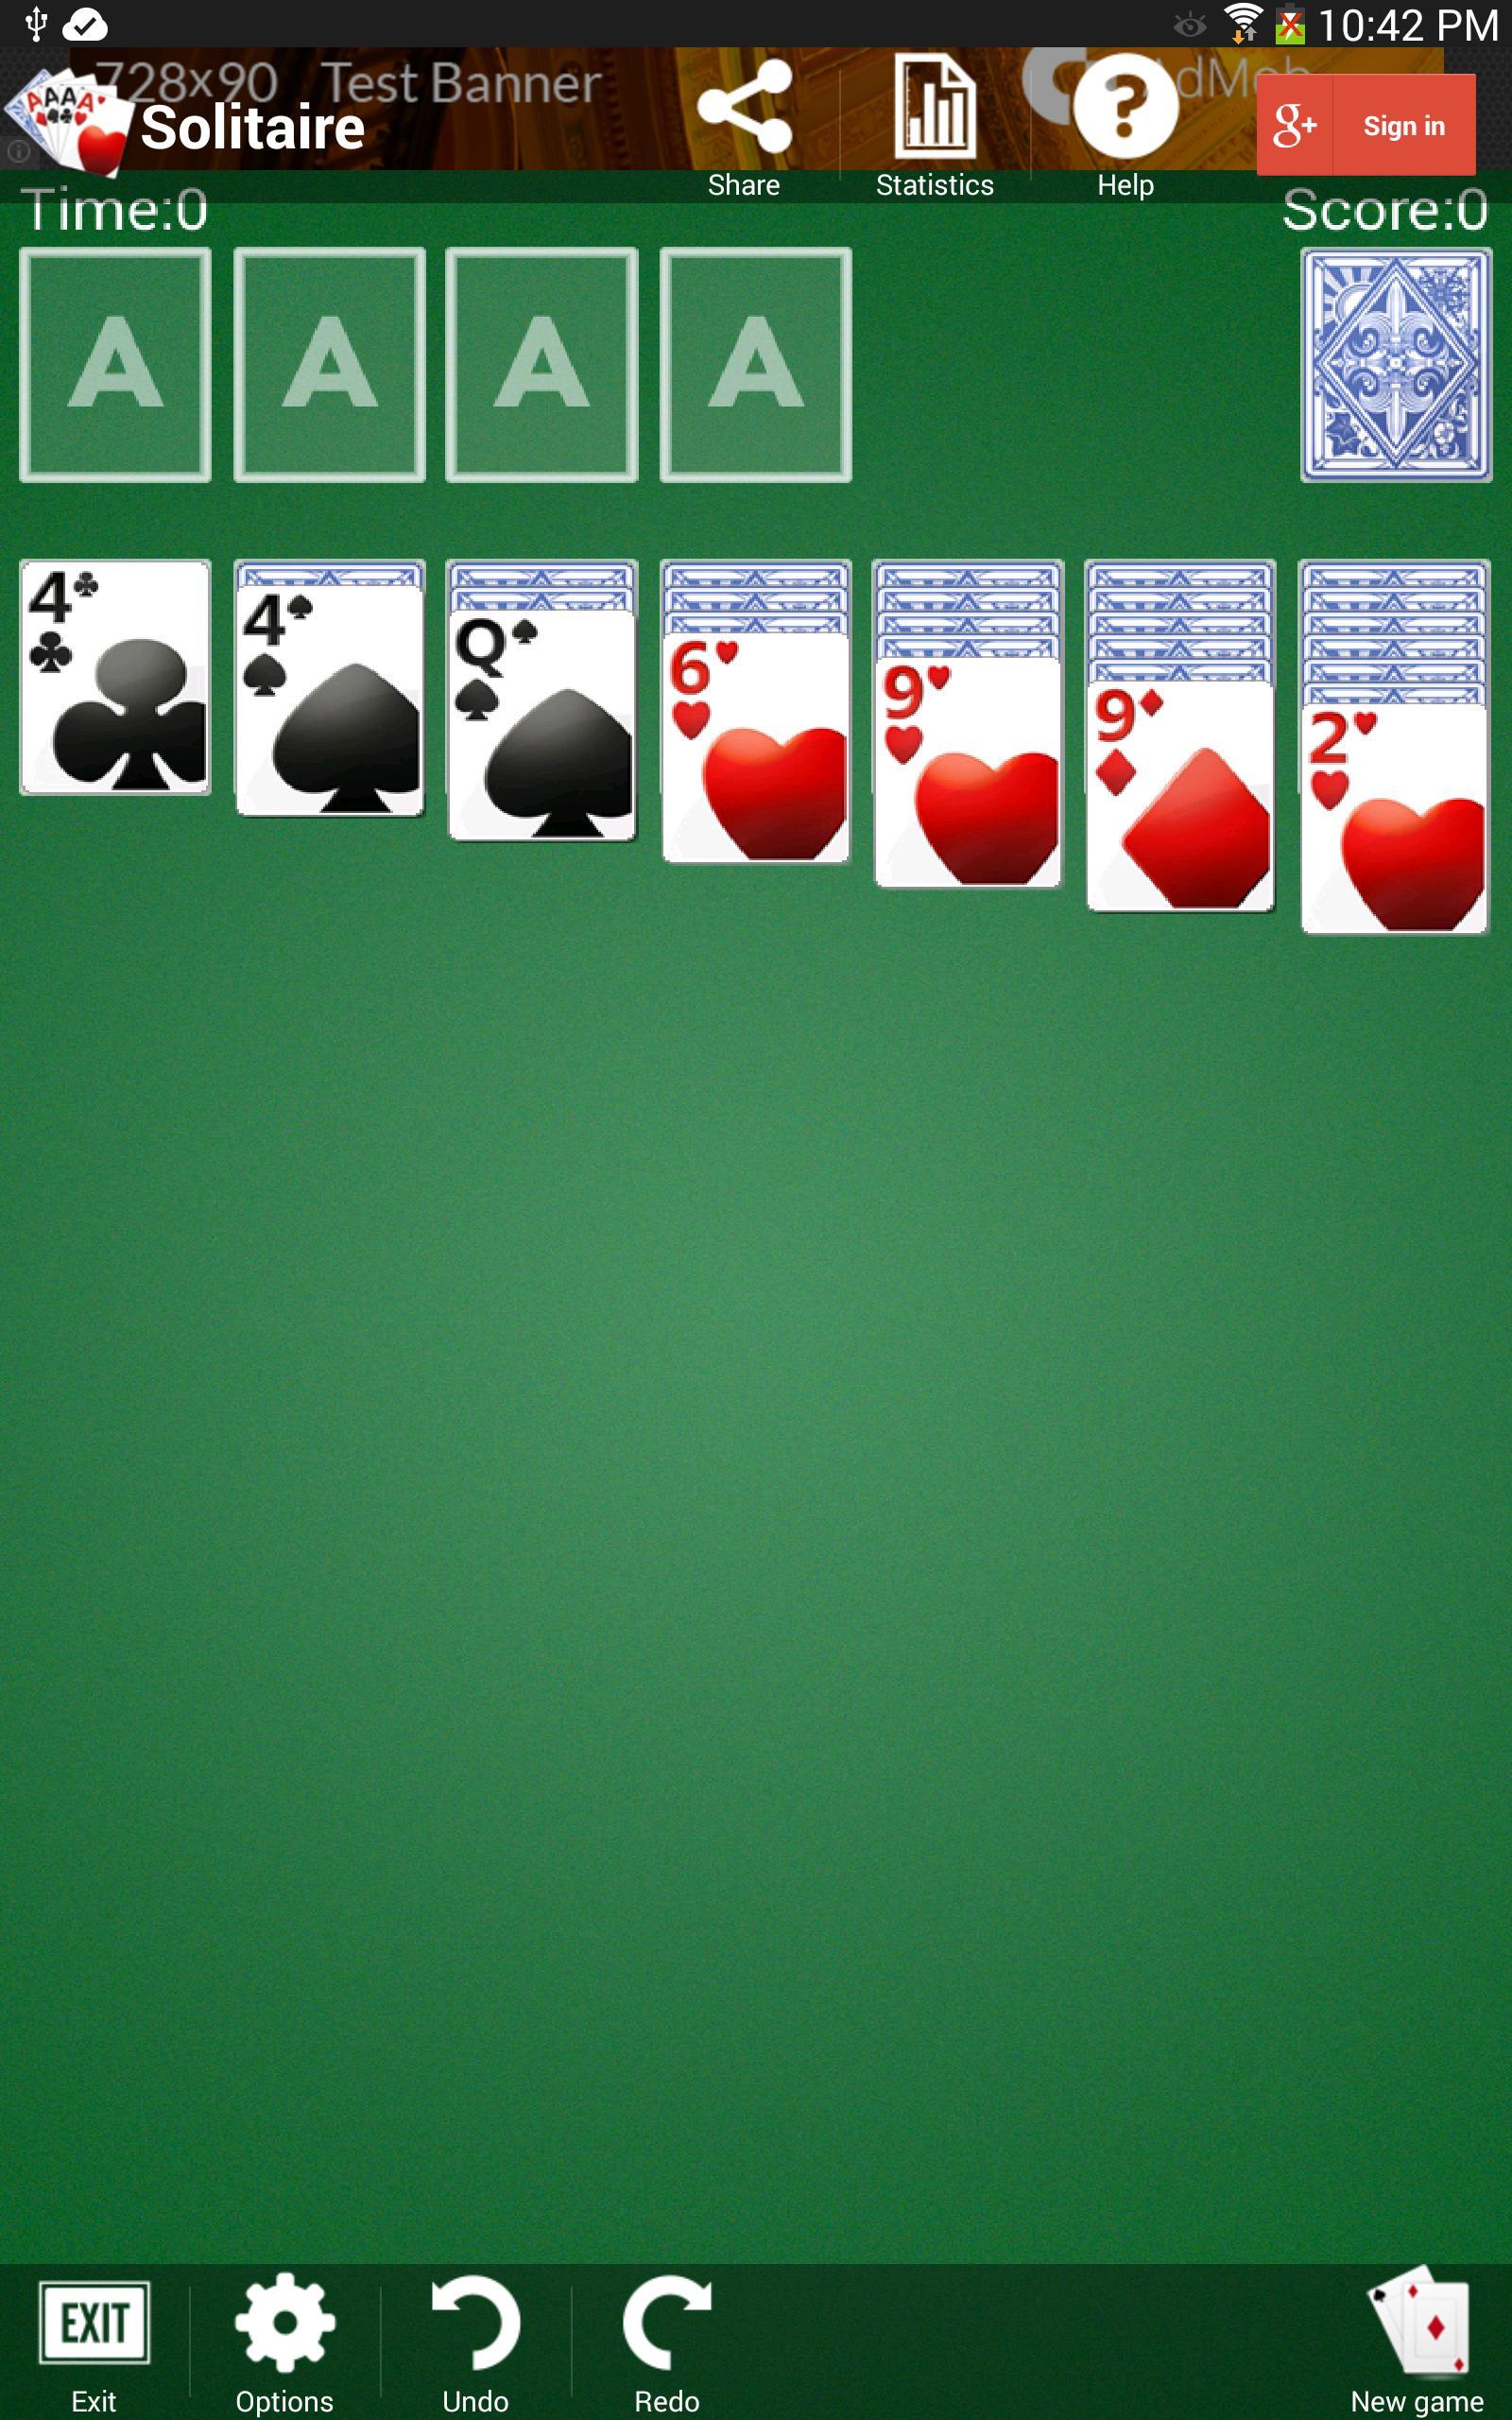 Solitaire 1.3.5 Screenshot 8